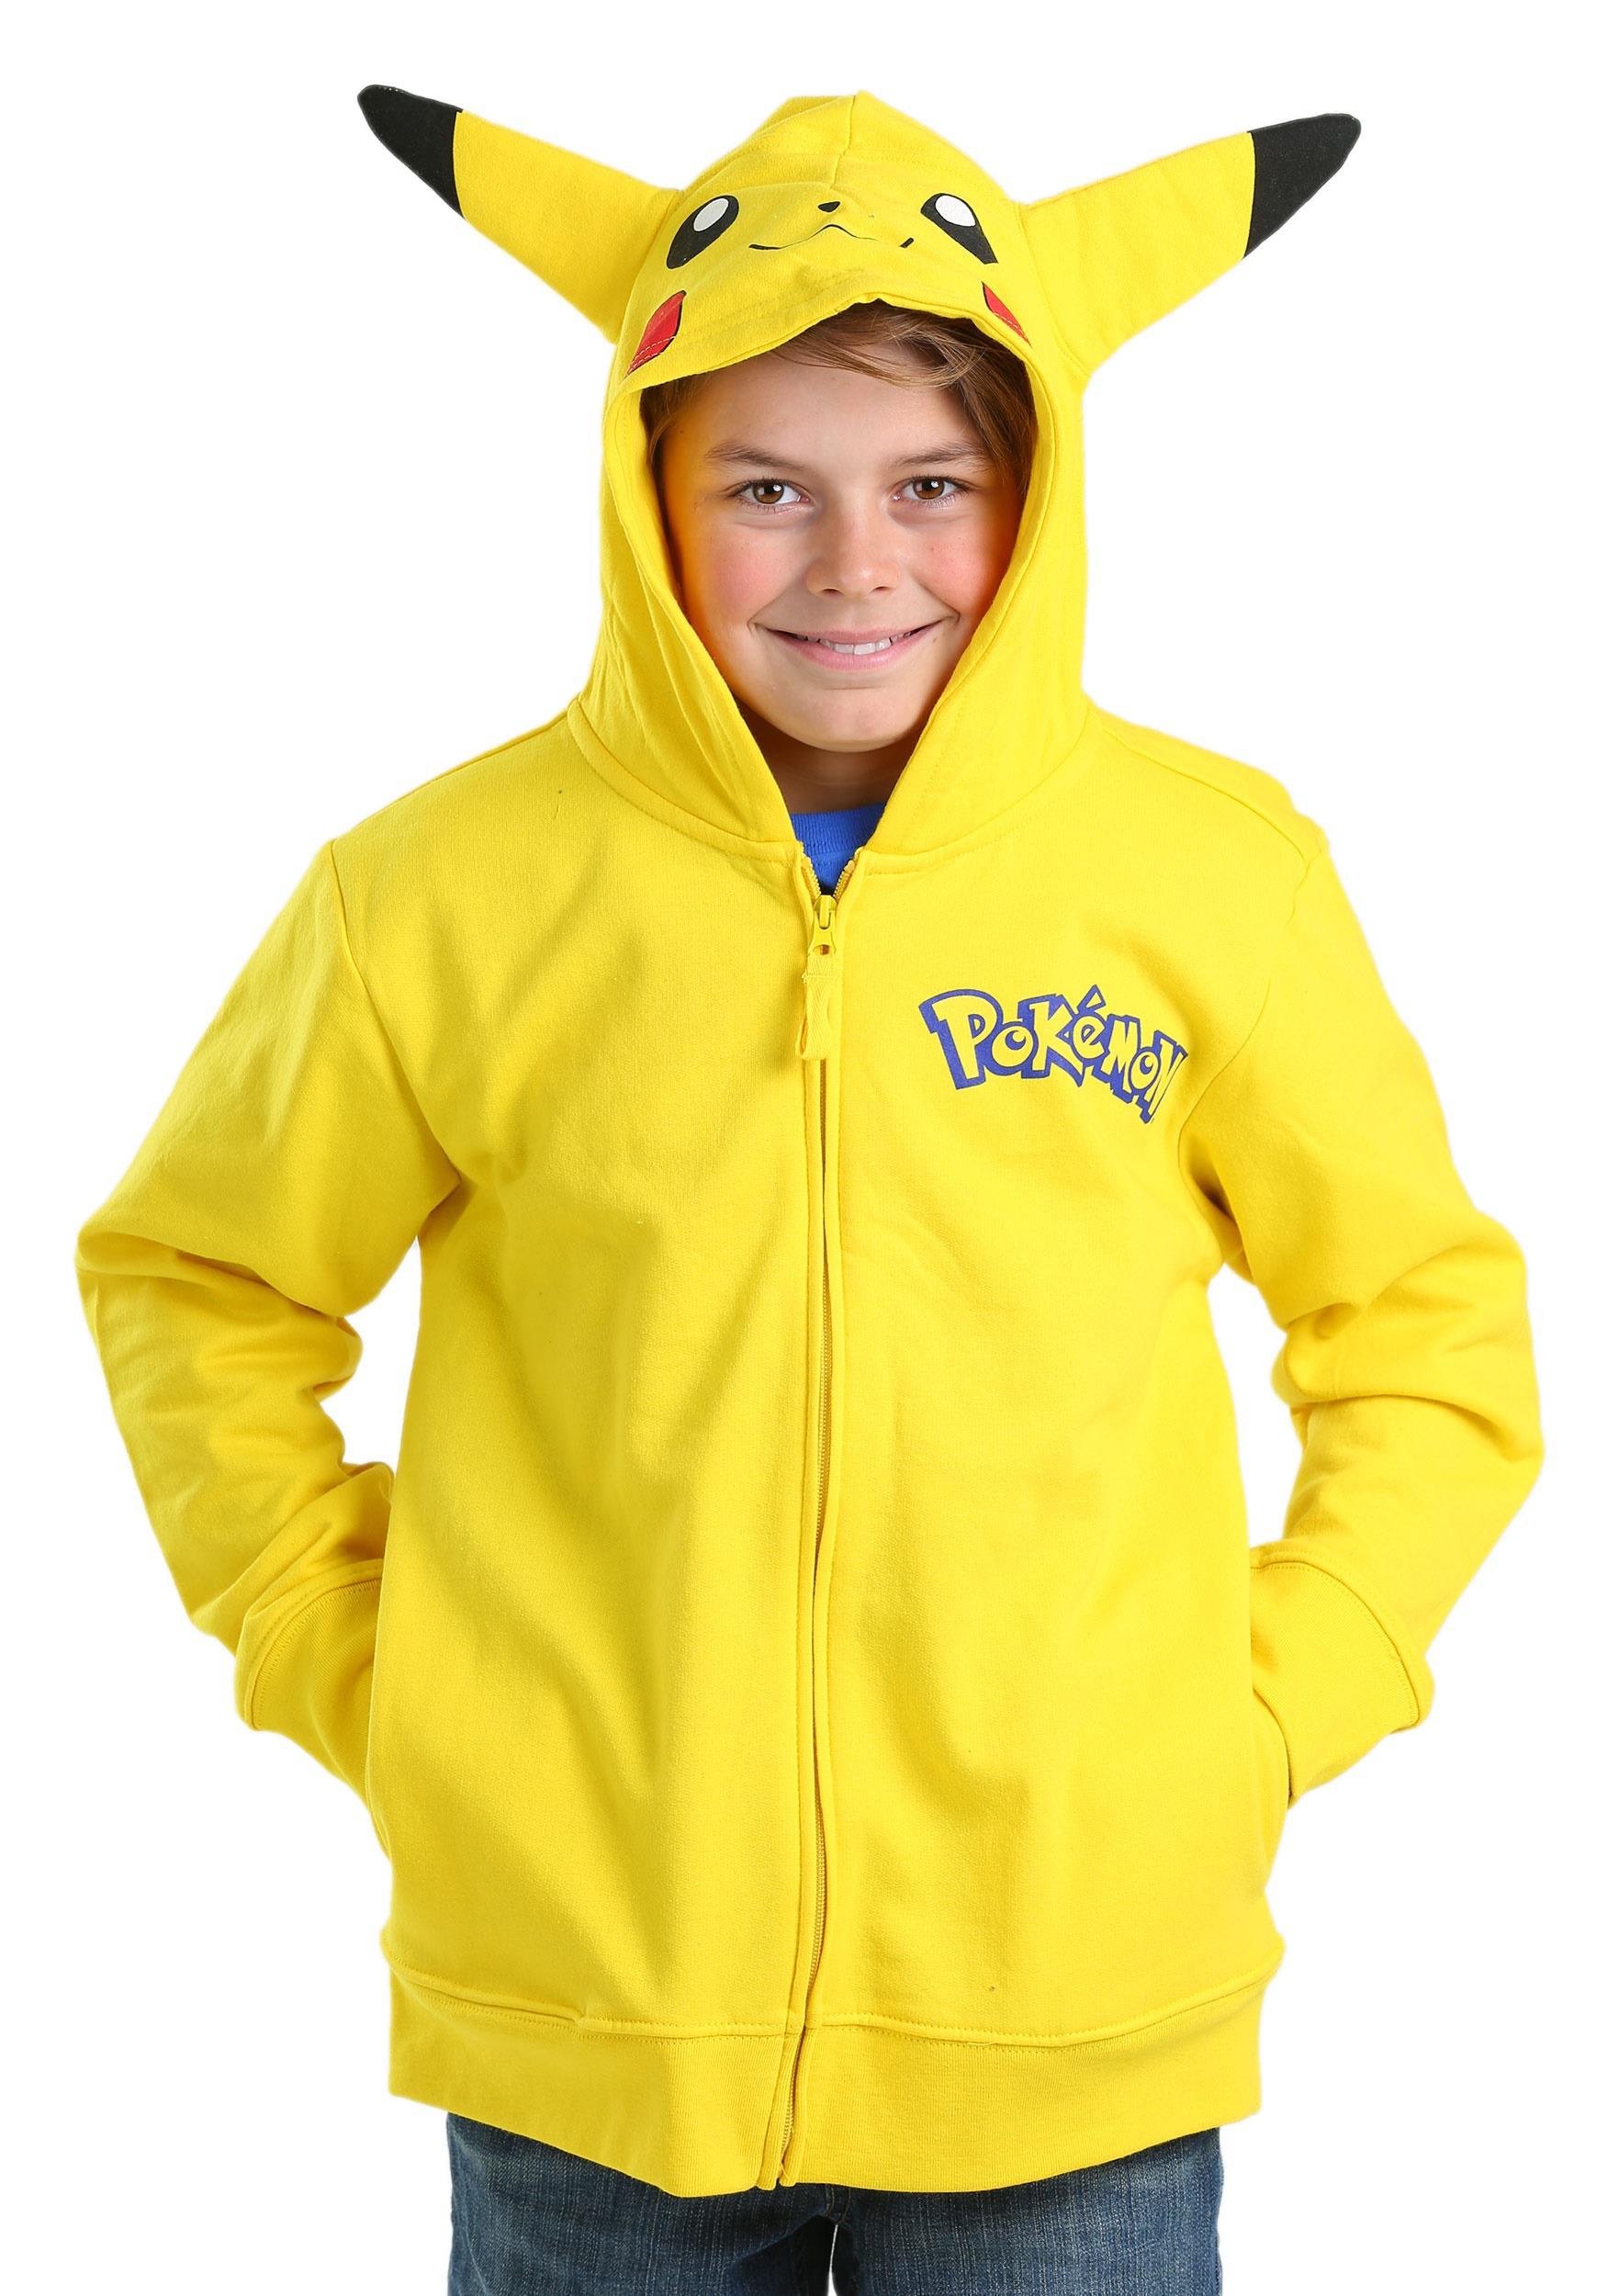 Pokemon Boys Pikachu Costume Sweatshirt FZMUSB156-6B30